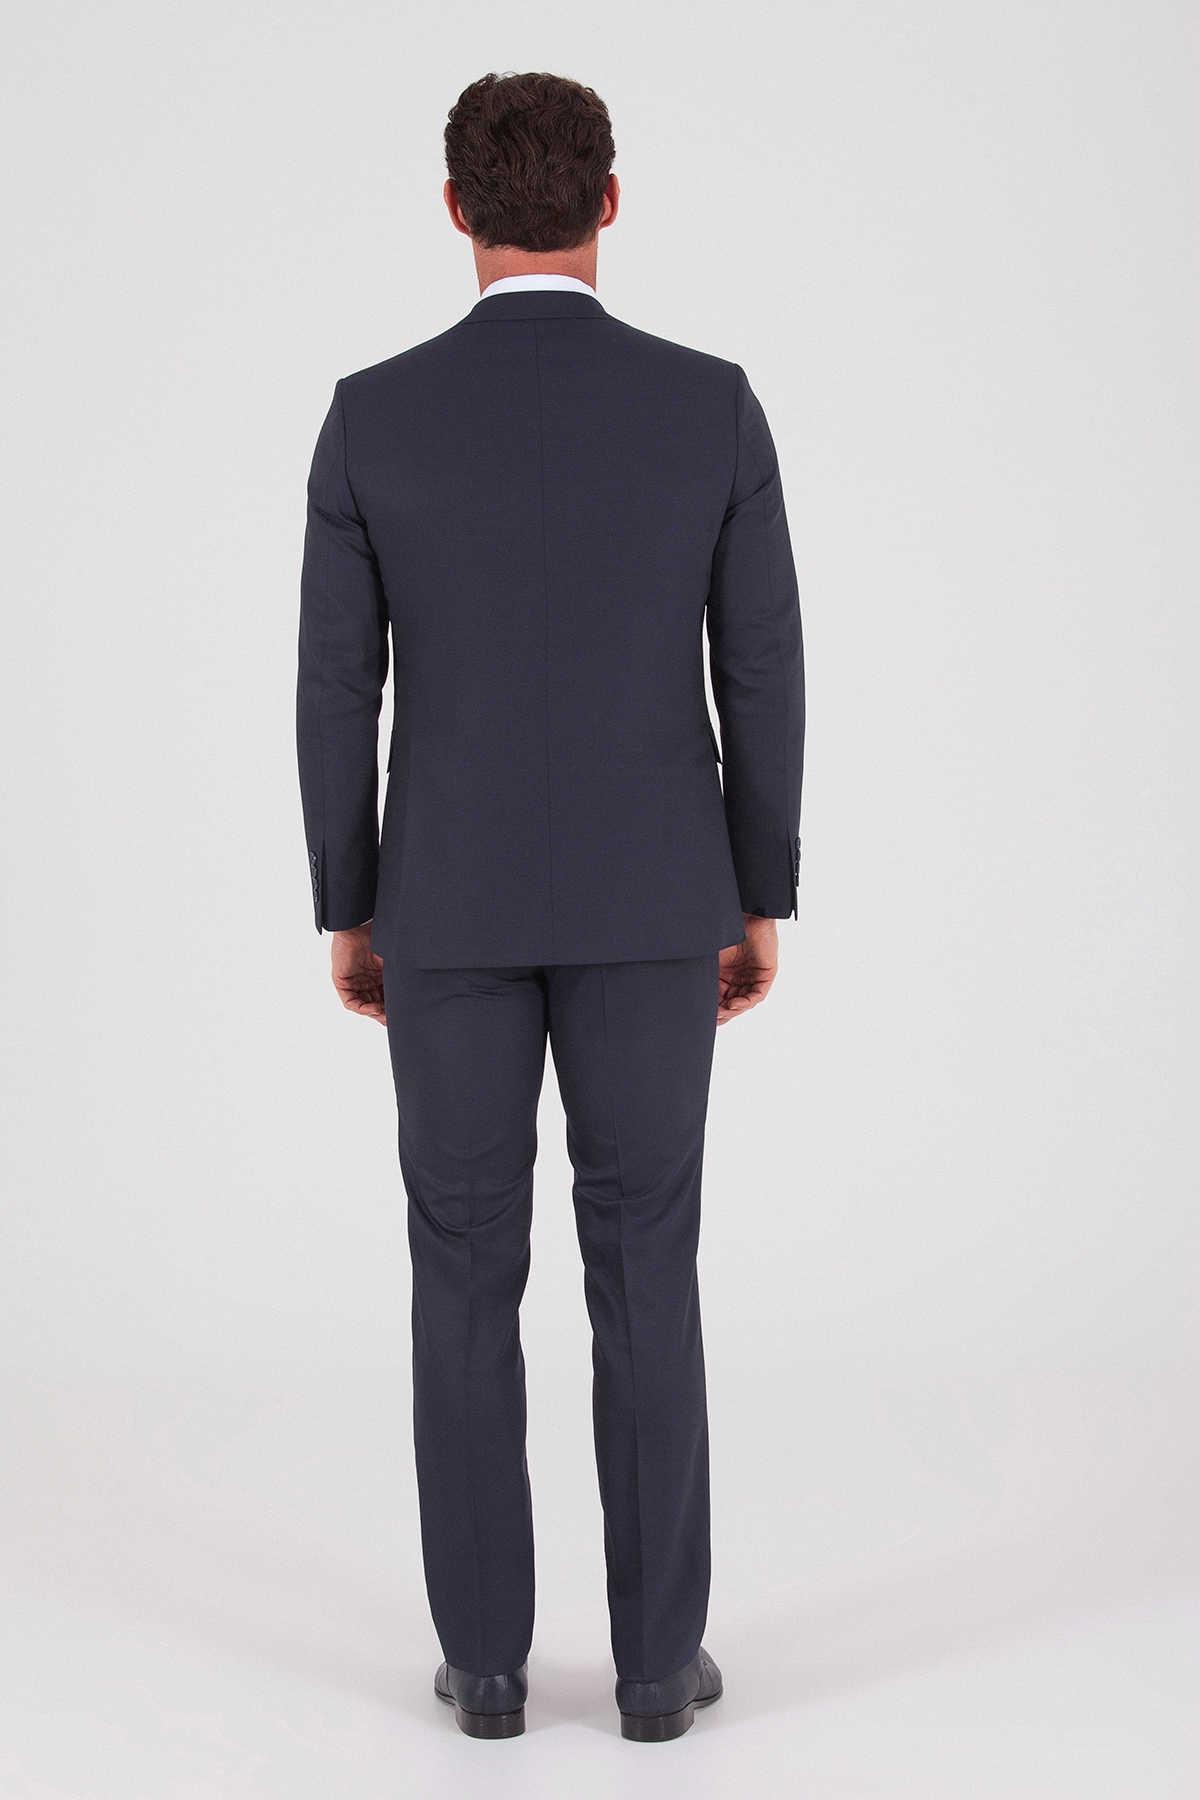 Hatemoğlu Yelekli Slim Fit Lacivert Takım Elbise 33202019D001 4